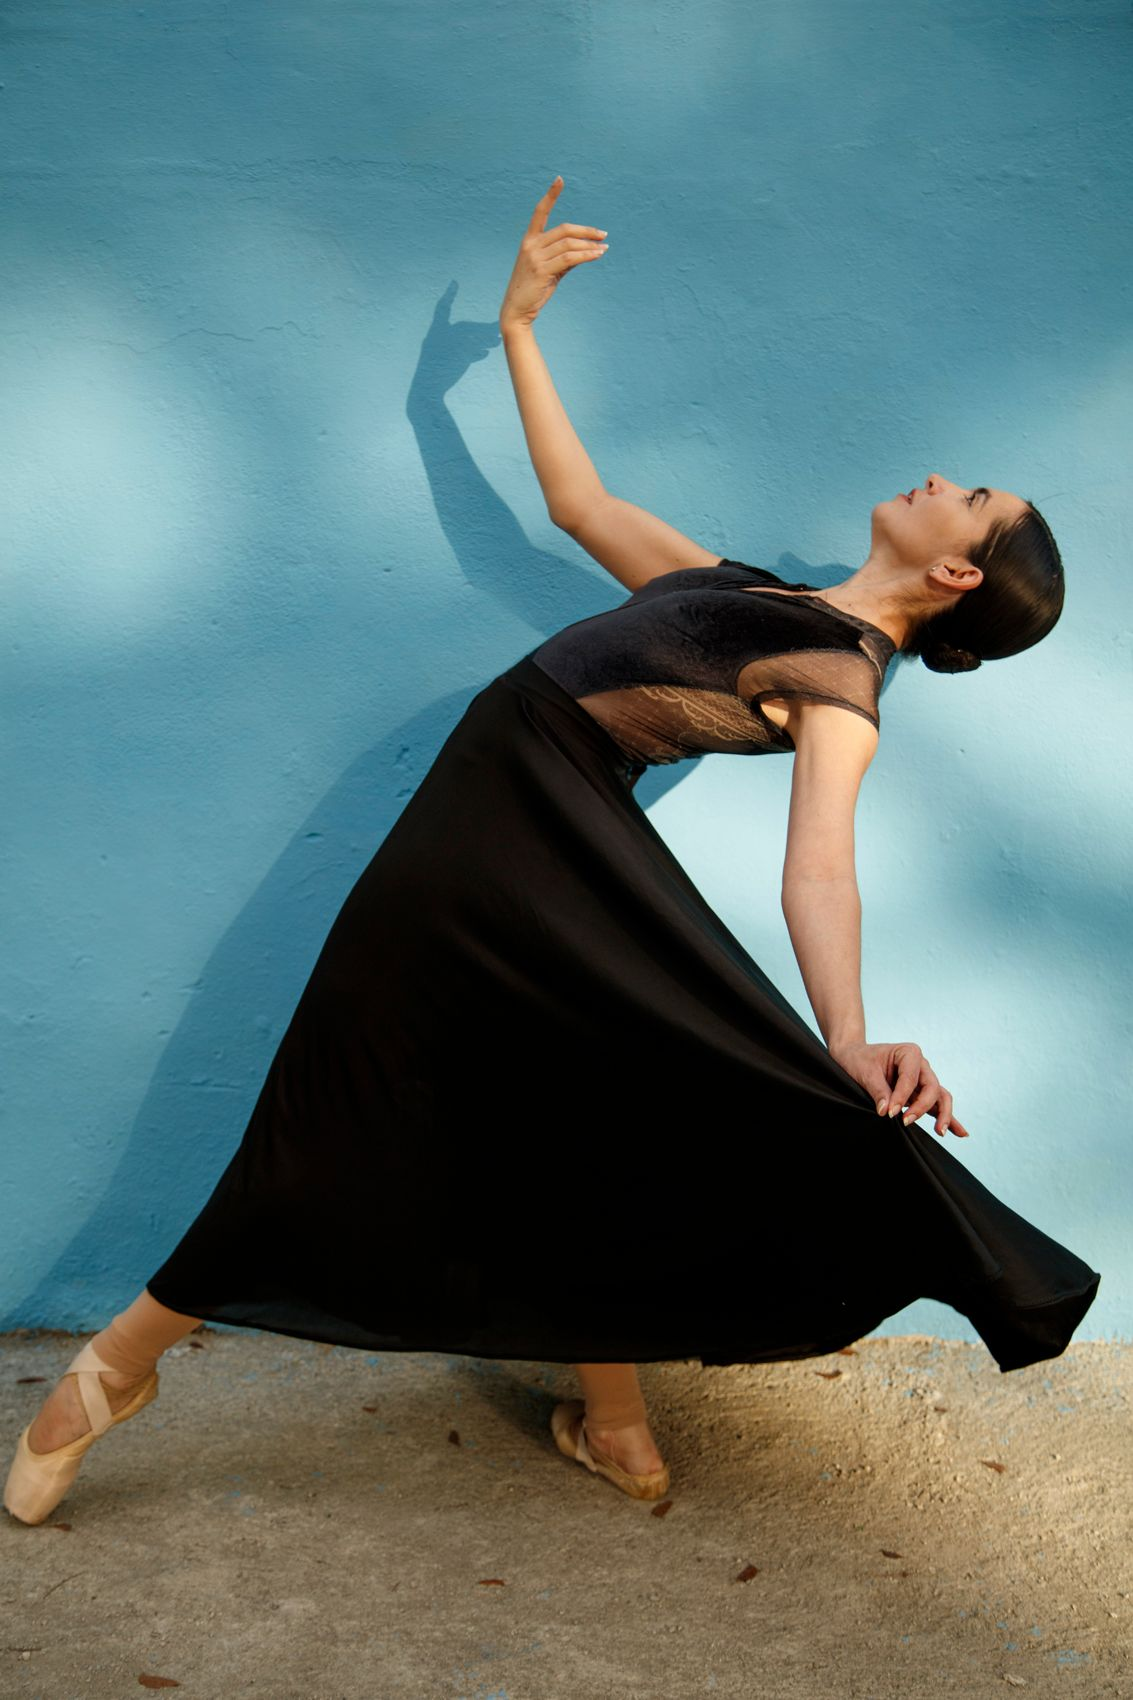 Ballet dancer  in  Centro Habana. Cuba.